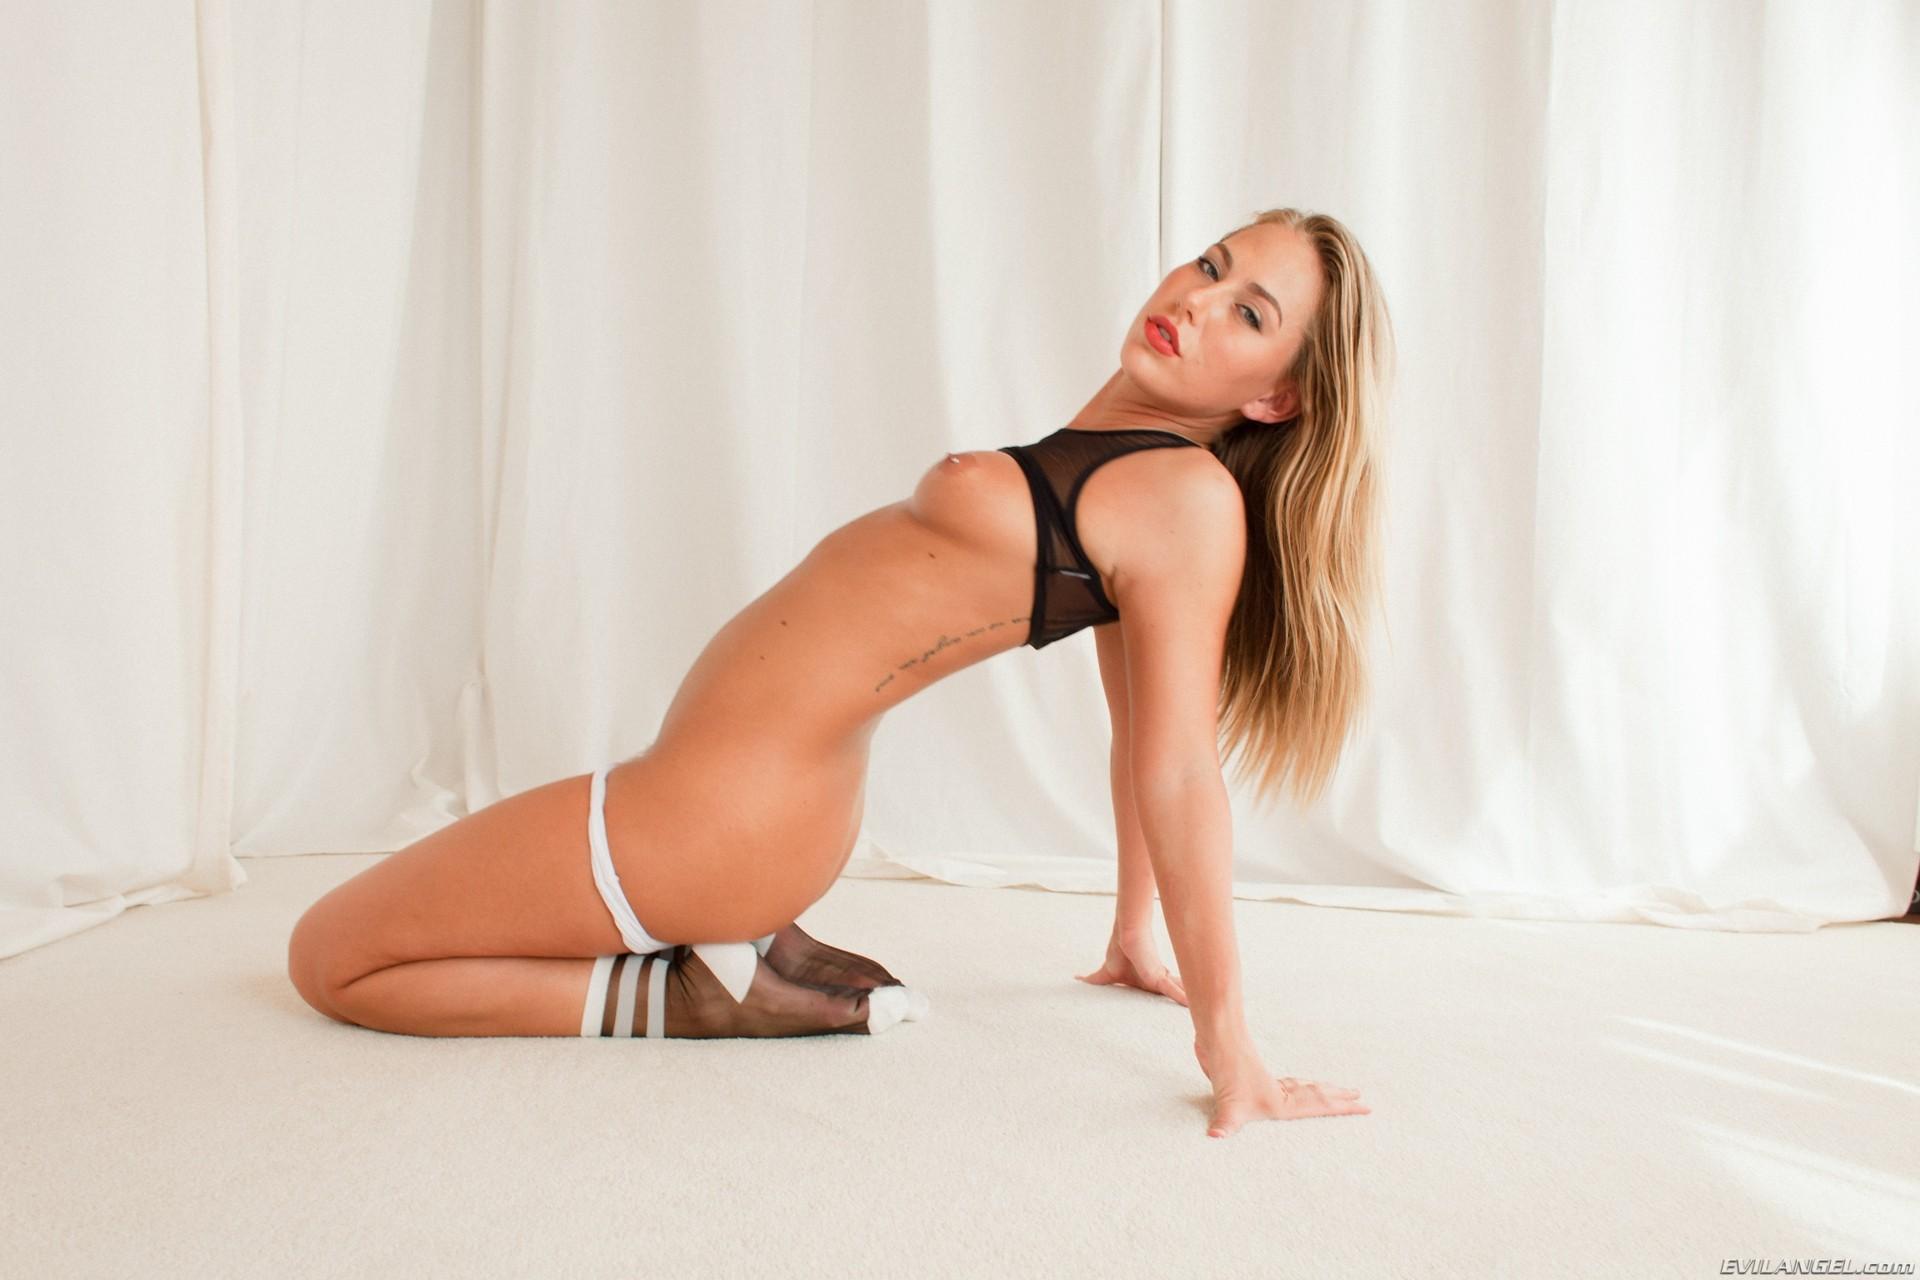 Anikka Albrite, Carter Cruise - Галерея 3463239